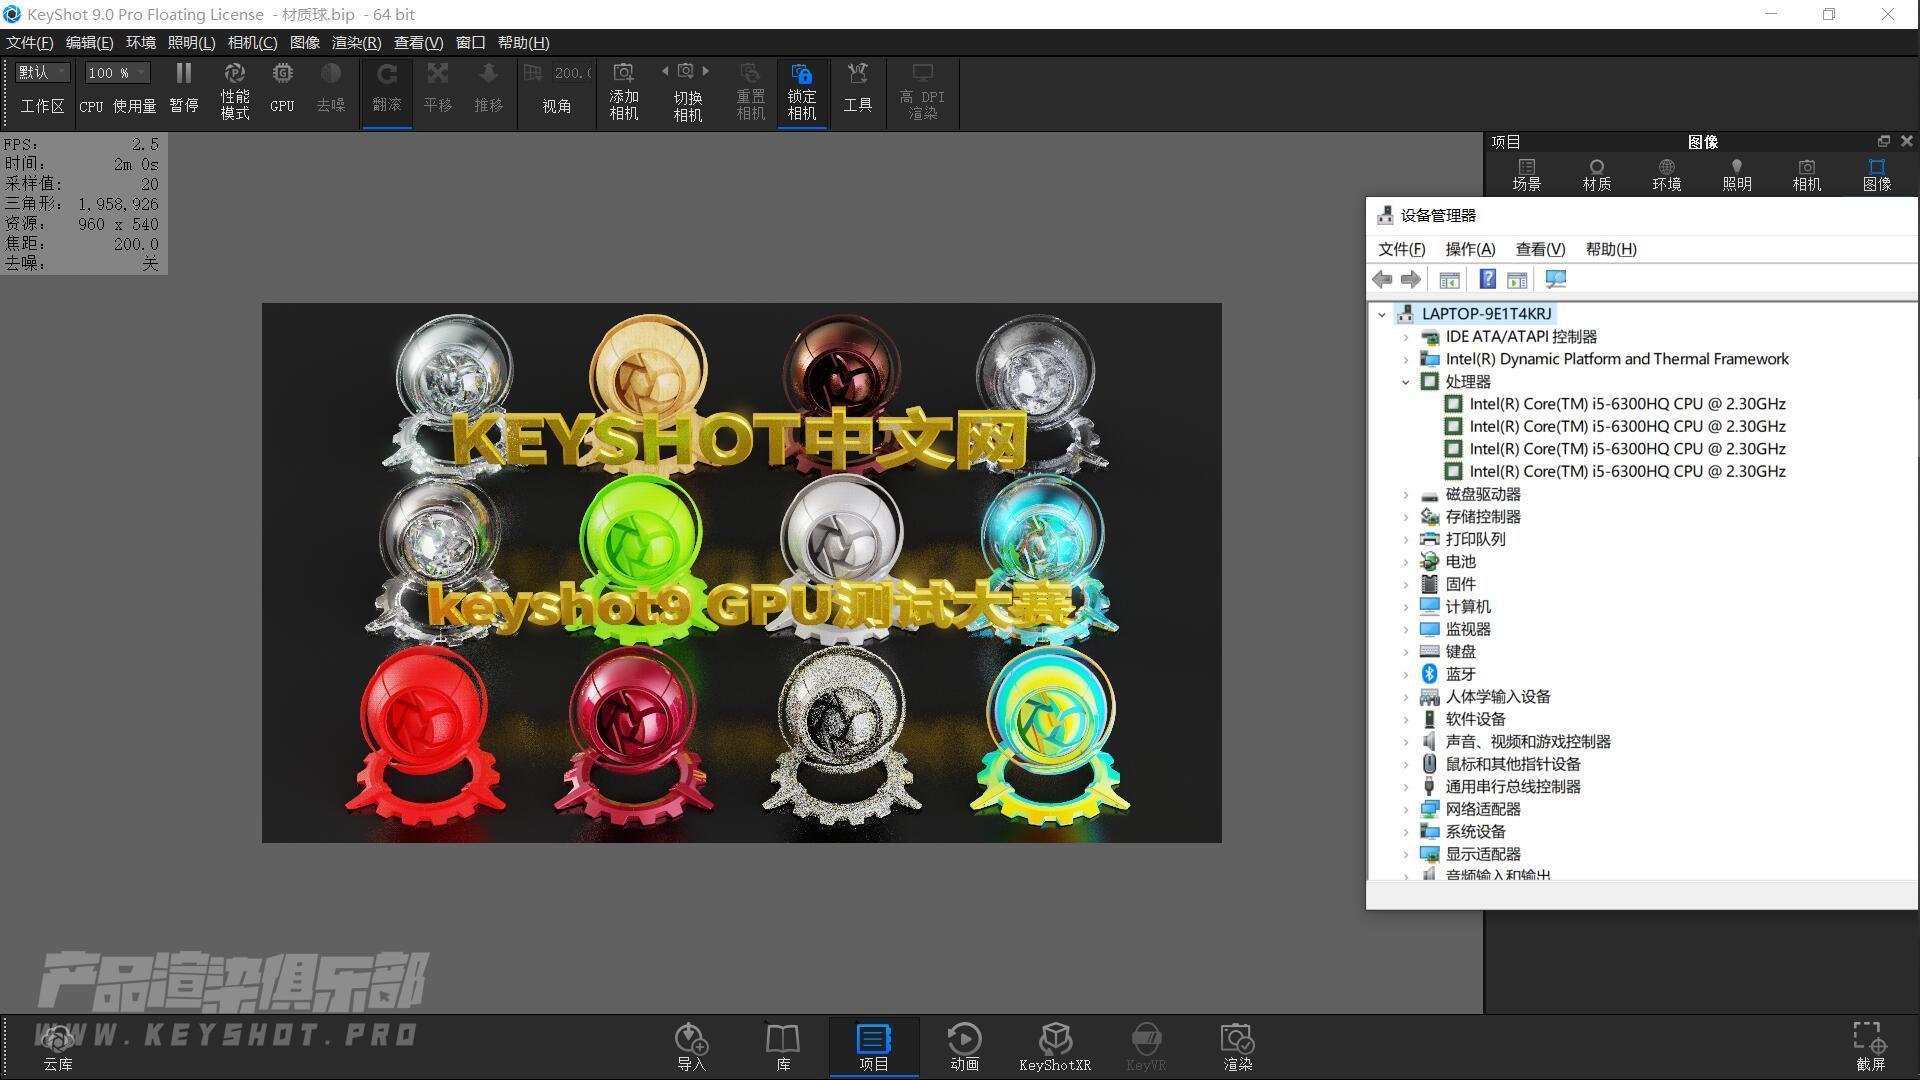 keyshot9 — Core i5-6300HQ+ GTX 960M 2G 评测